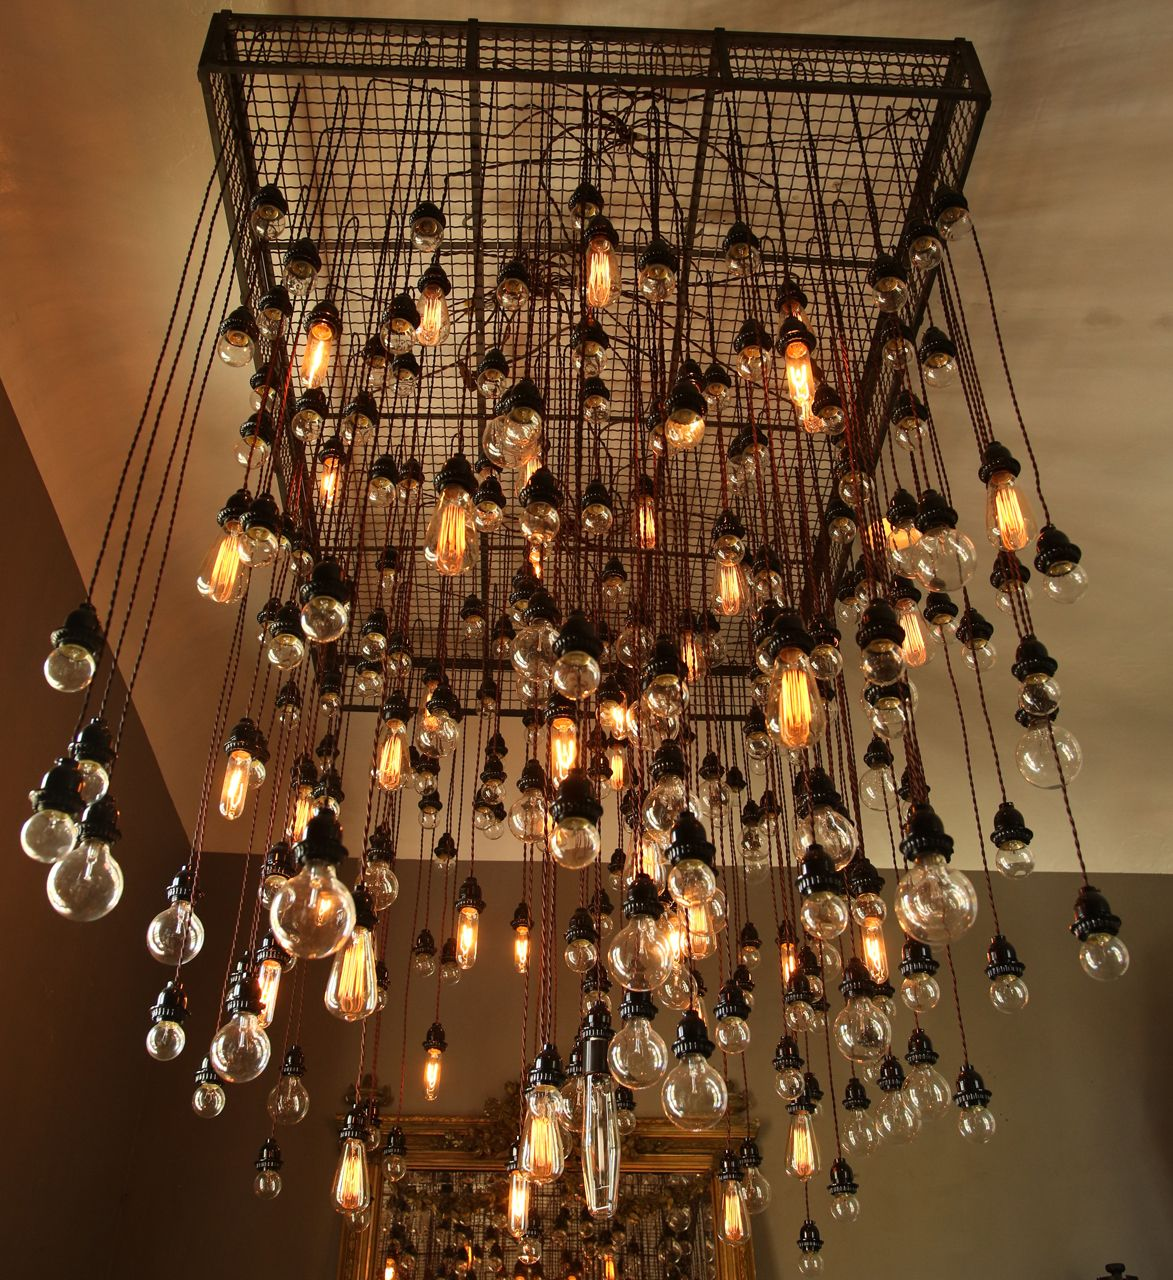 285 Bulb Industrial Chandelier 1stdibs Com Industrial